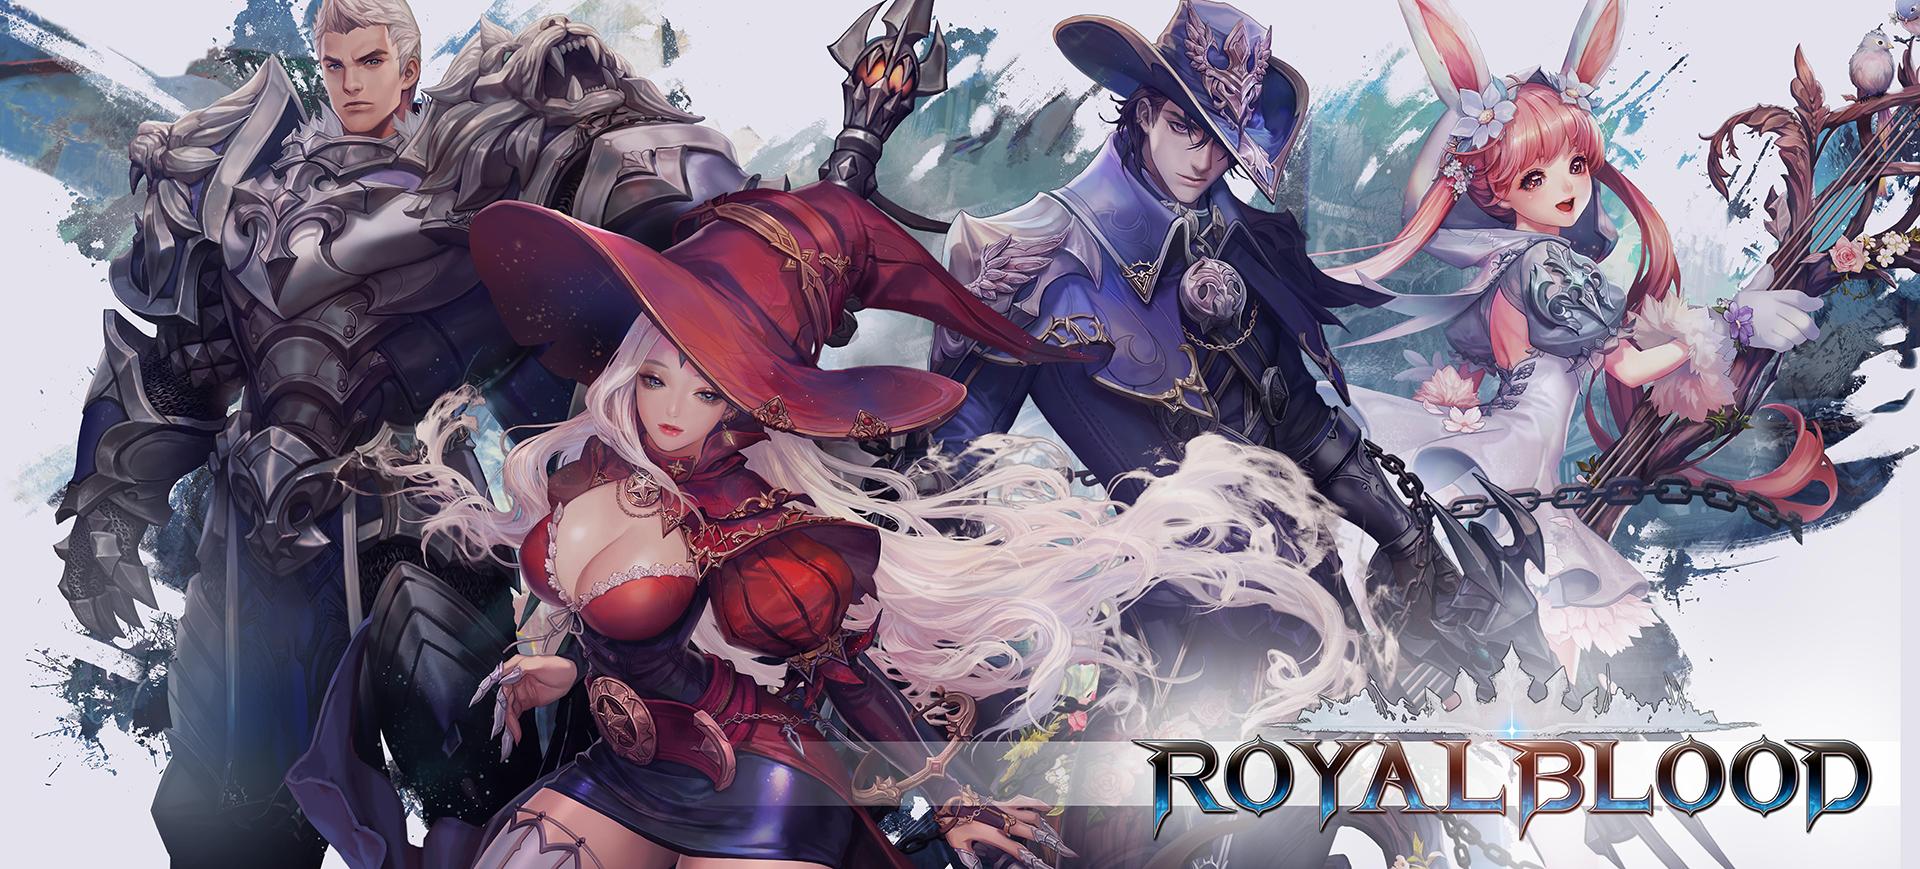 Royal Blood 2262018 1